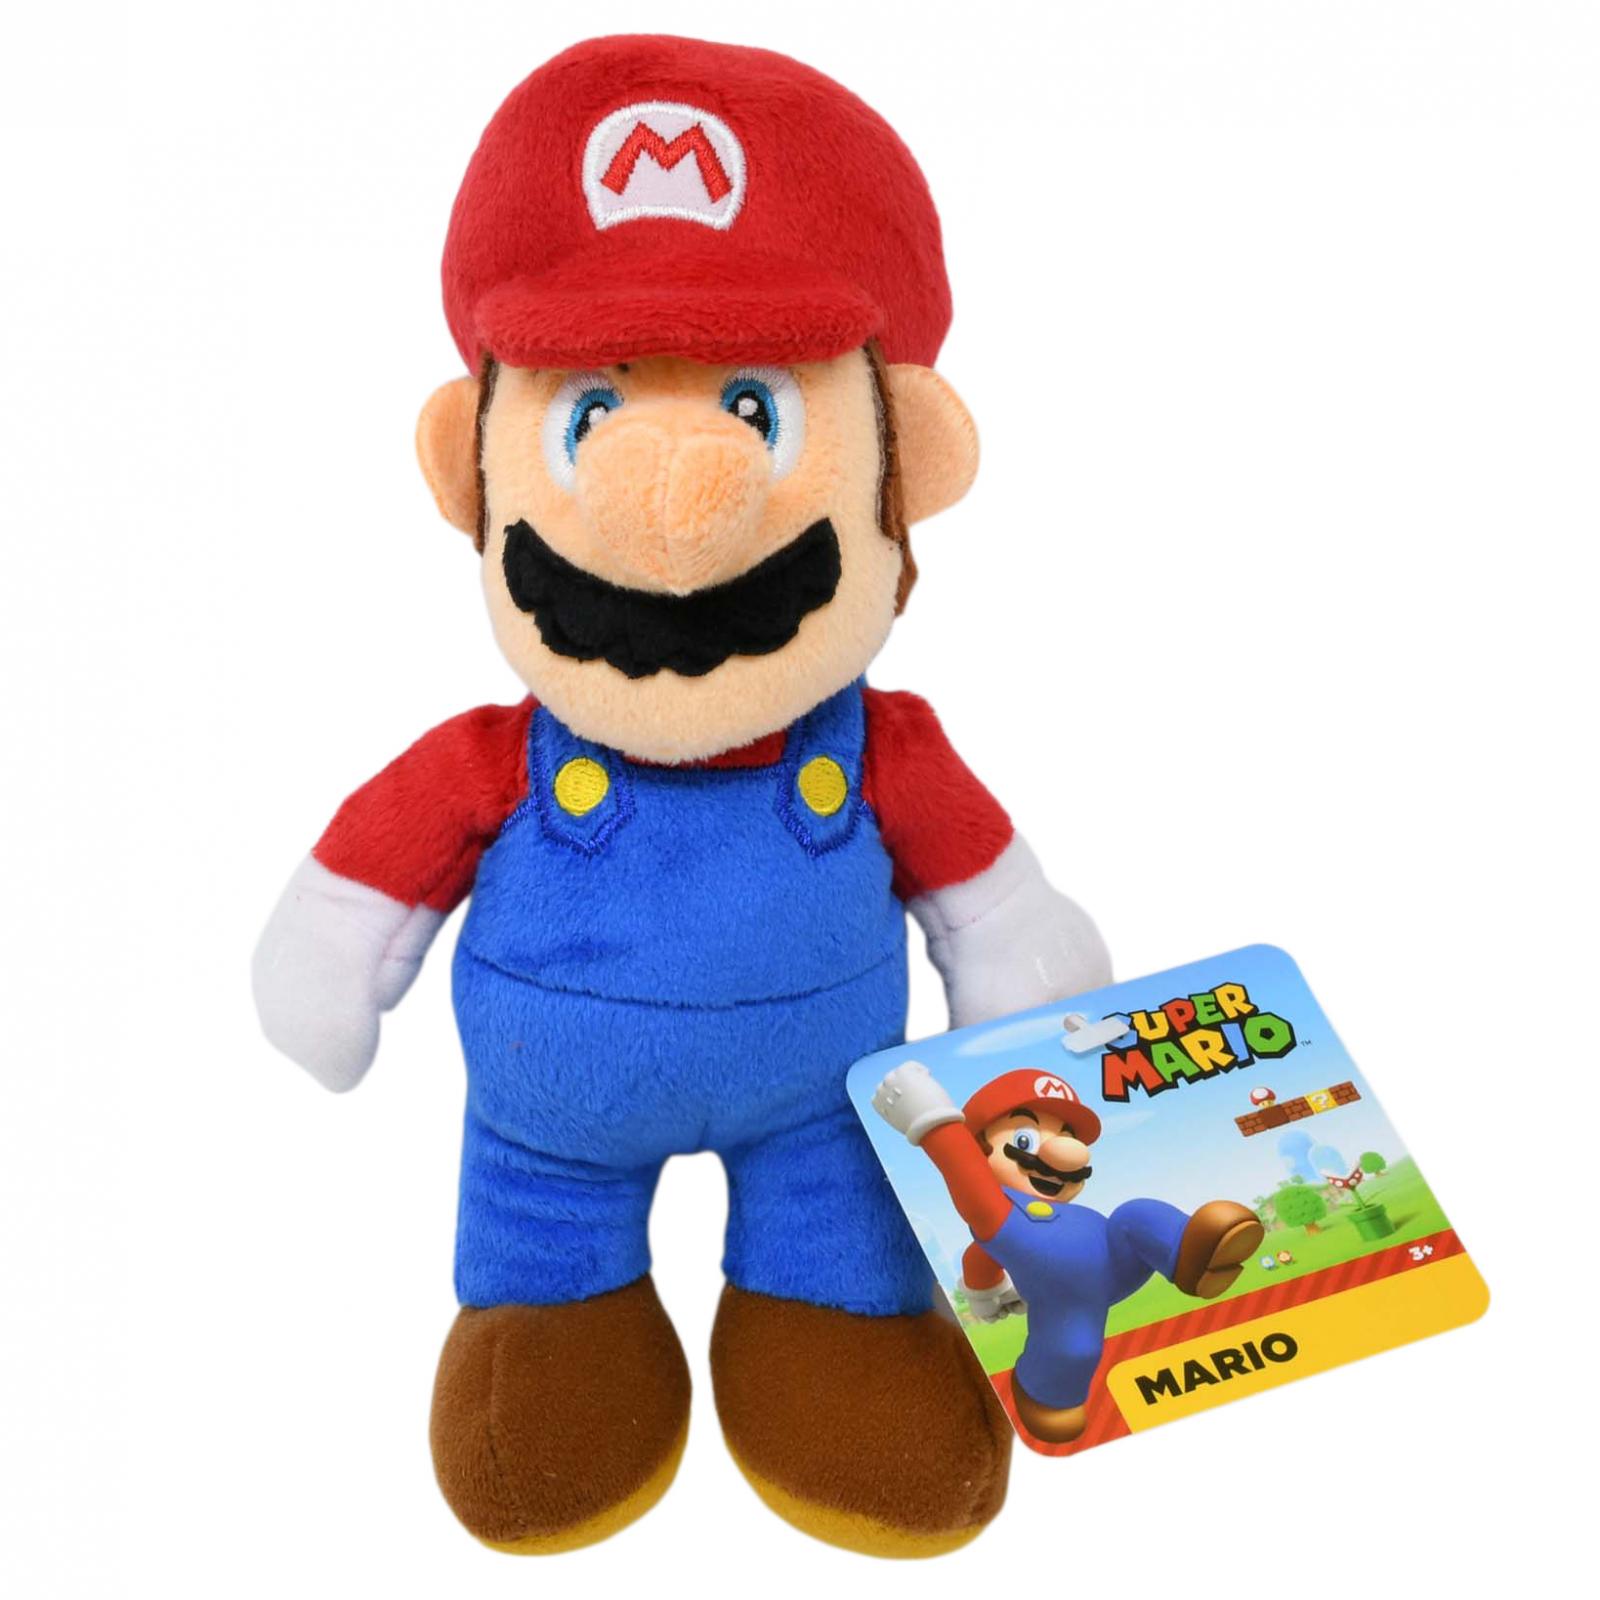 World of Nintendo Super Mario Plush Toy 7.5 Inch Classic Mario